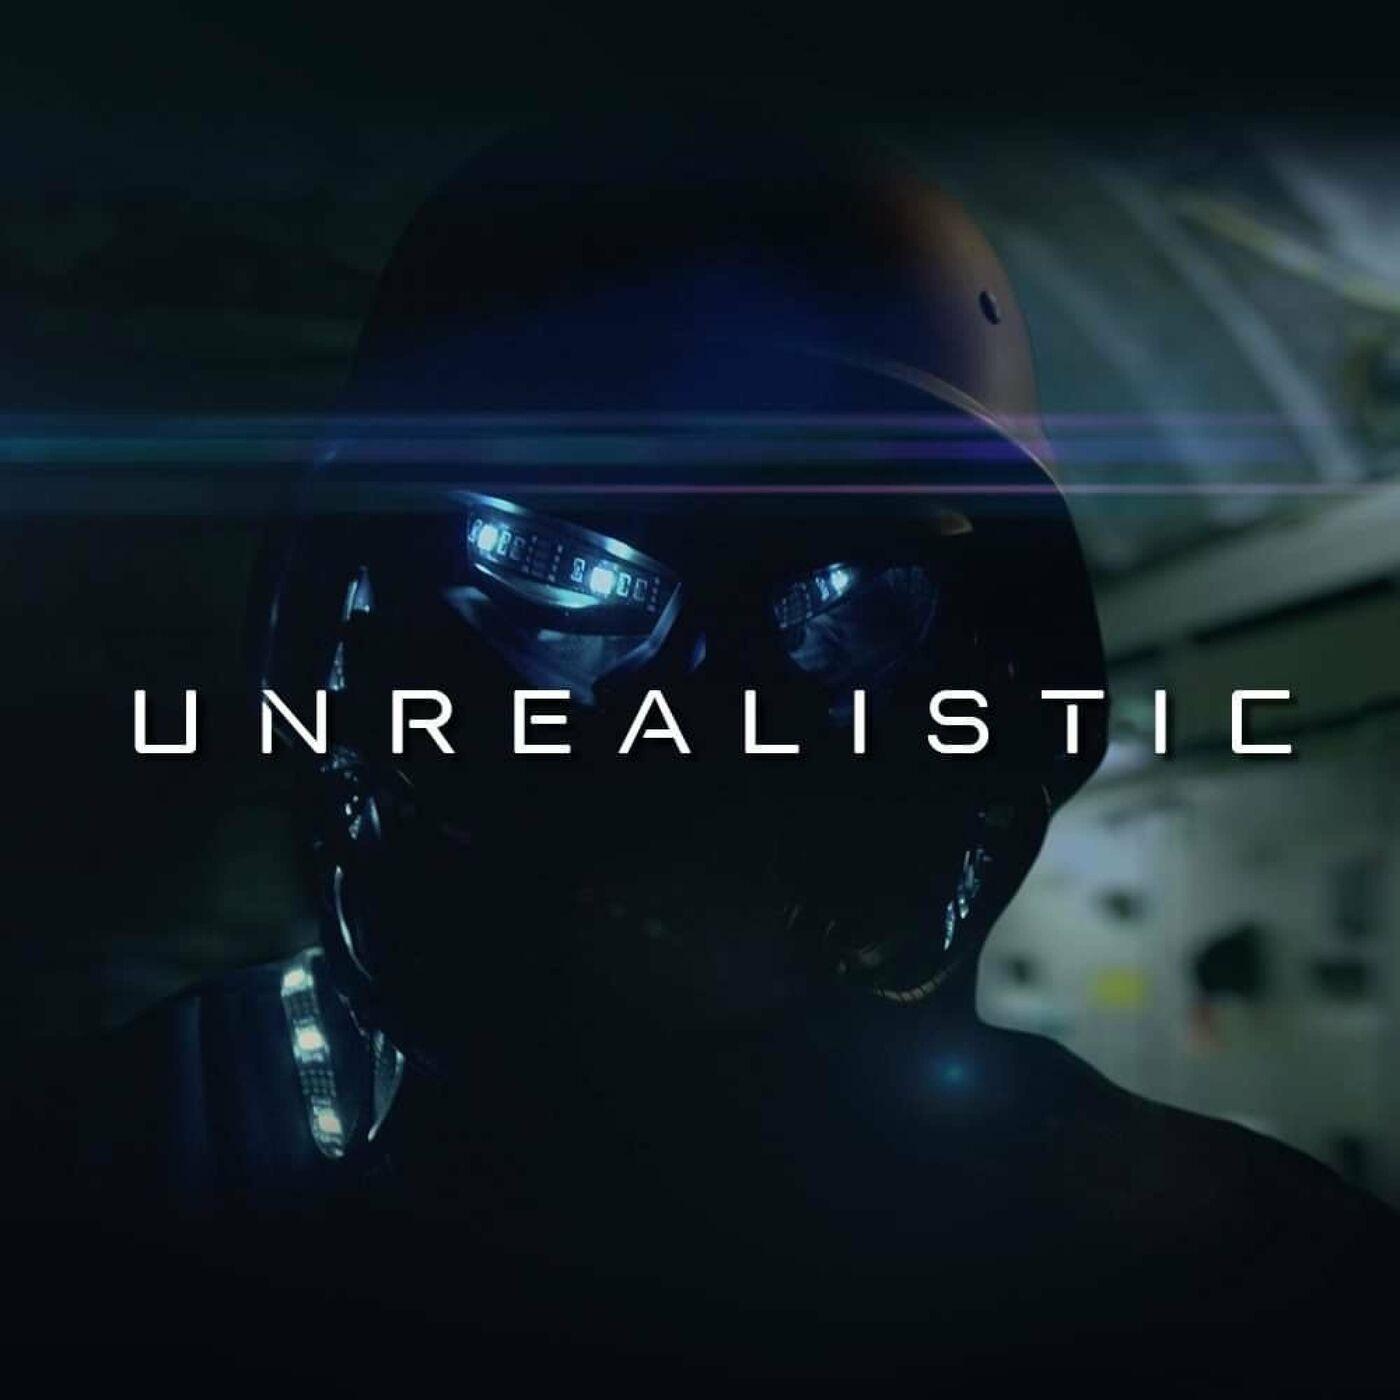 The Sight of Impact - Unrealistic [single] (2021)